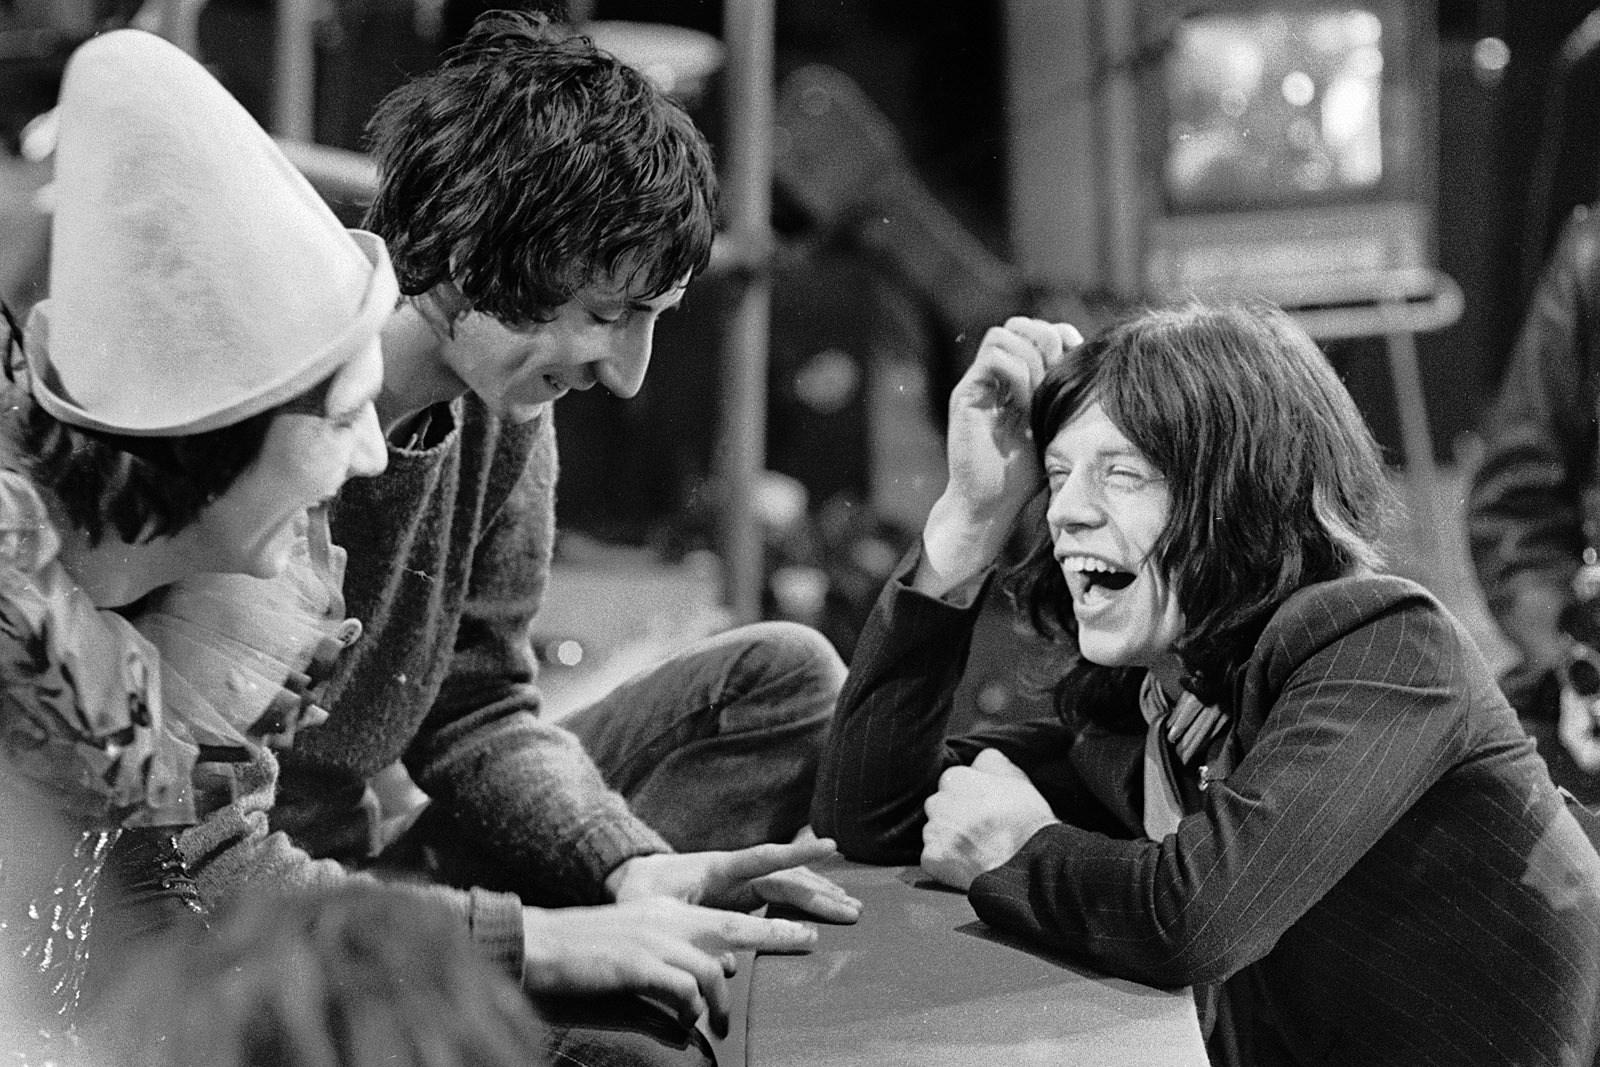 Mick Jagger Jacket Life Size Cutout